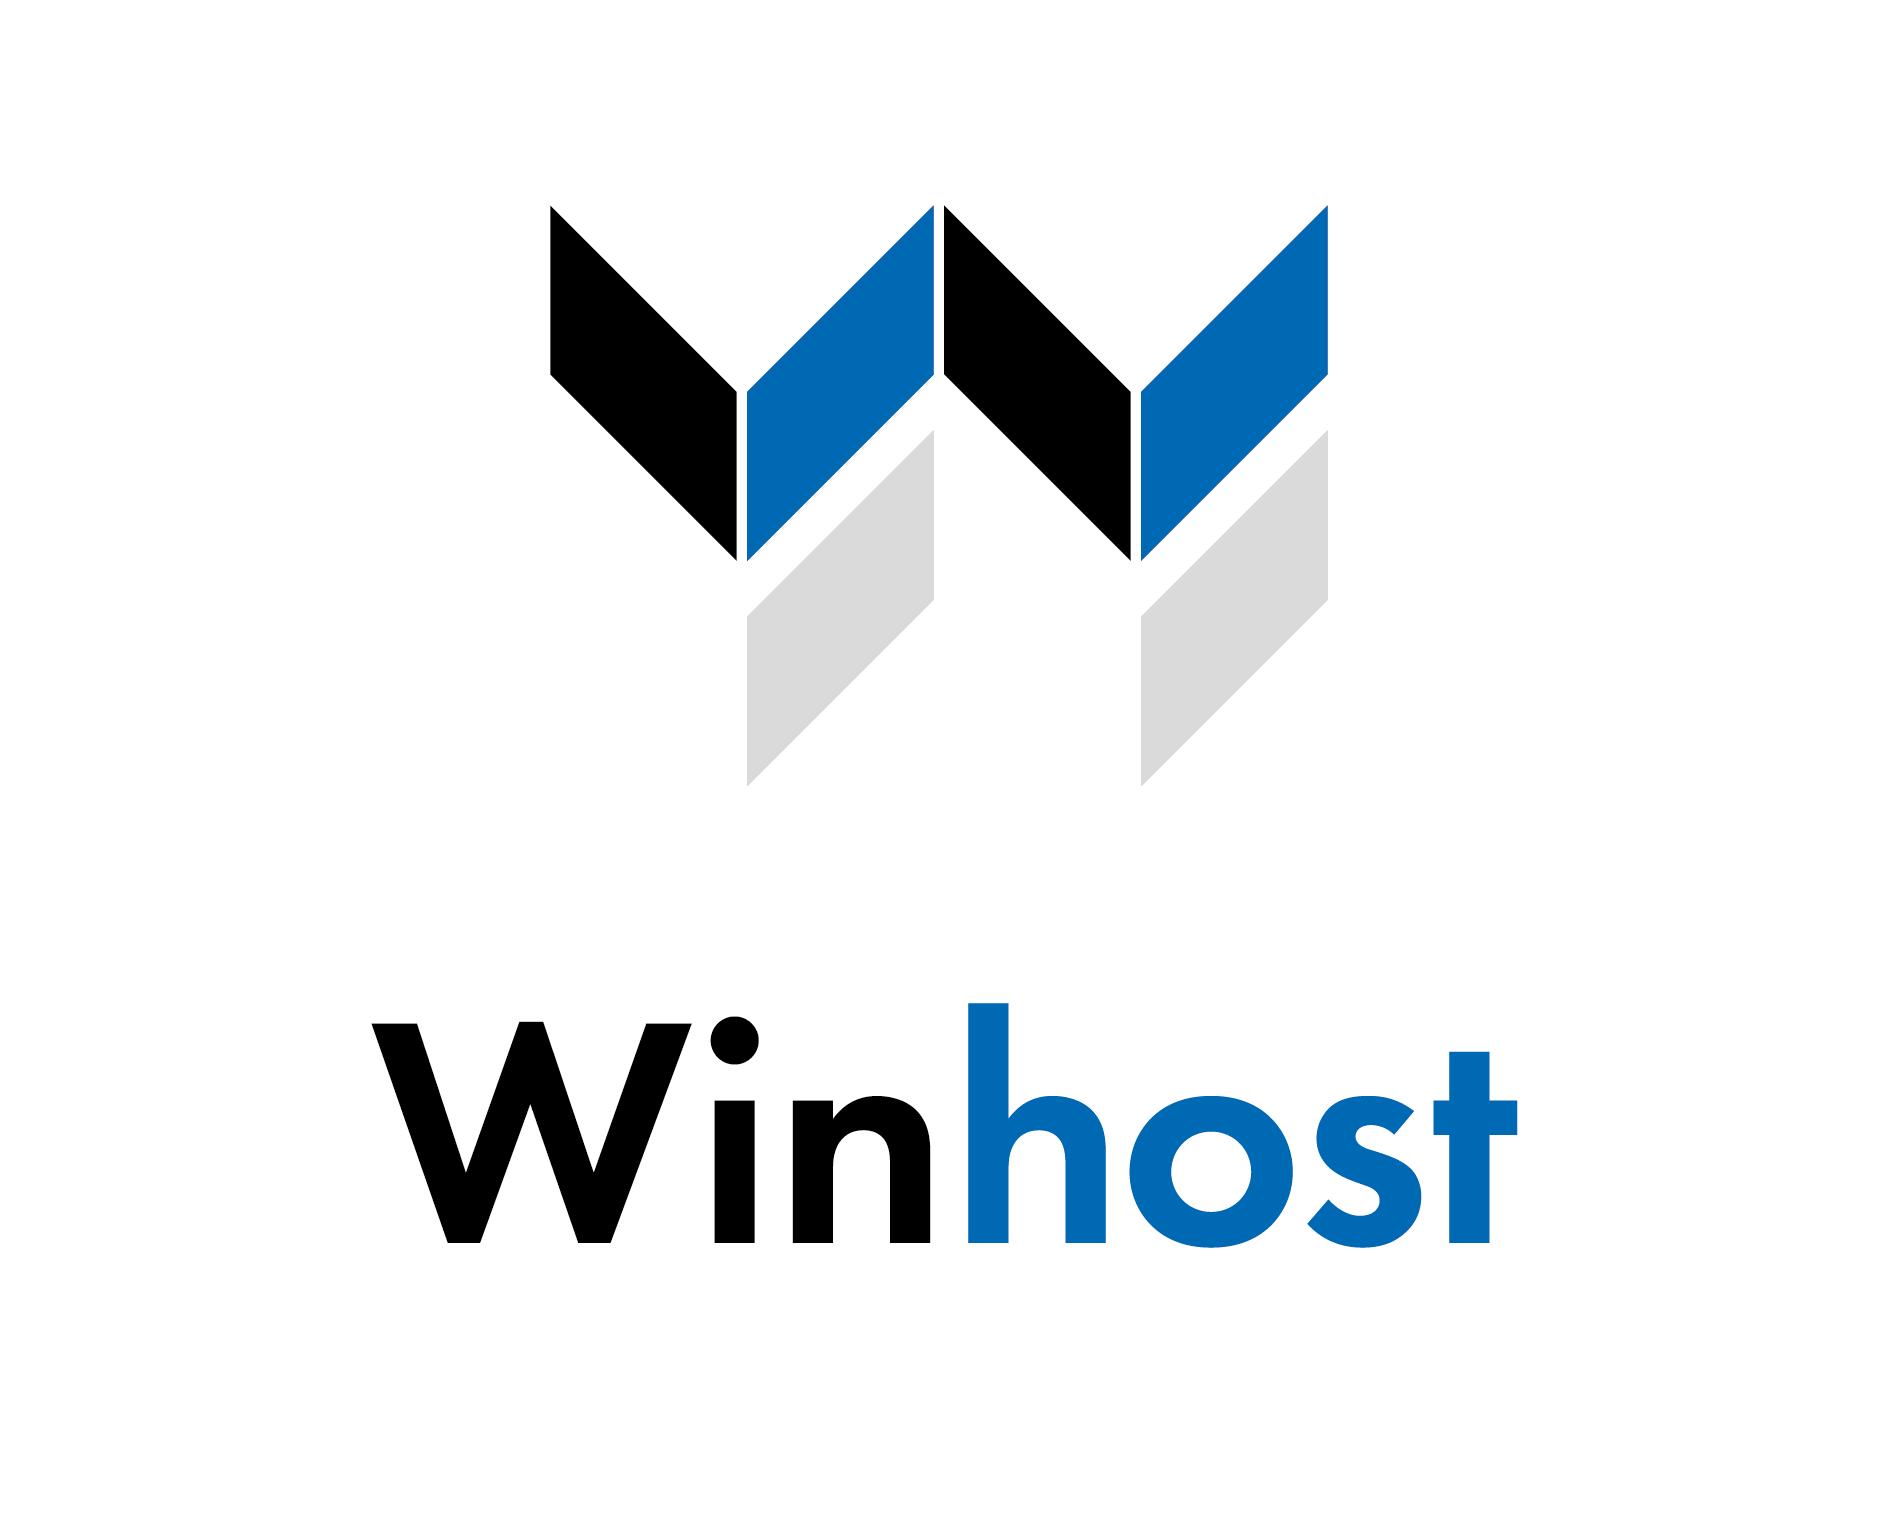 Winhost 2 - PM